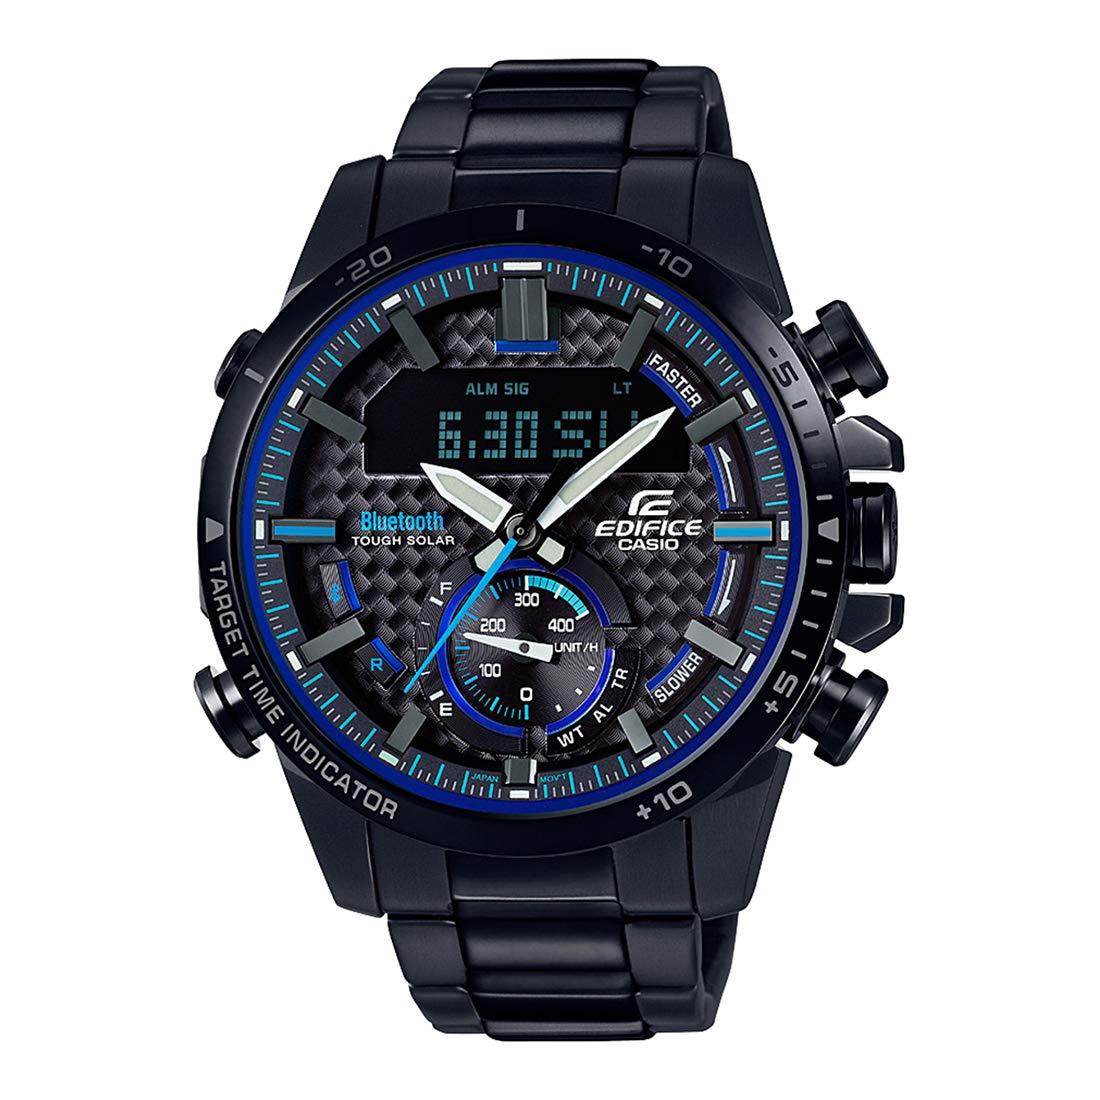 Casio - Top 10 Luxury Watch Brands in India